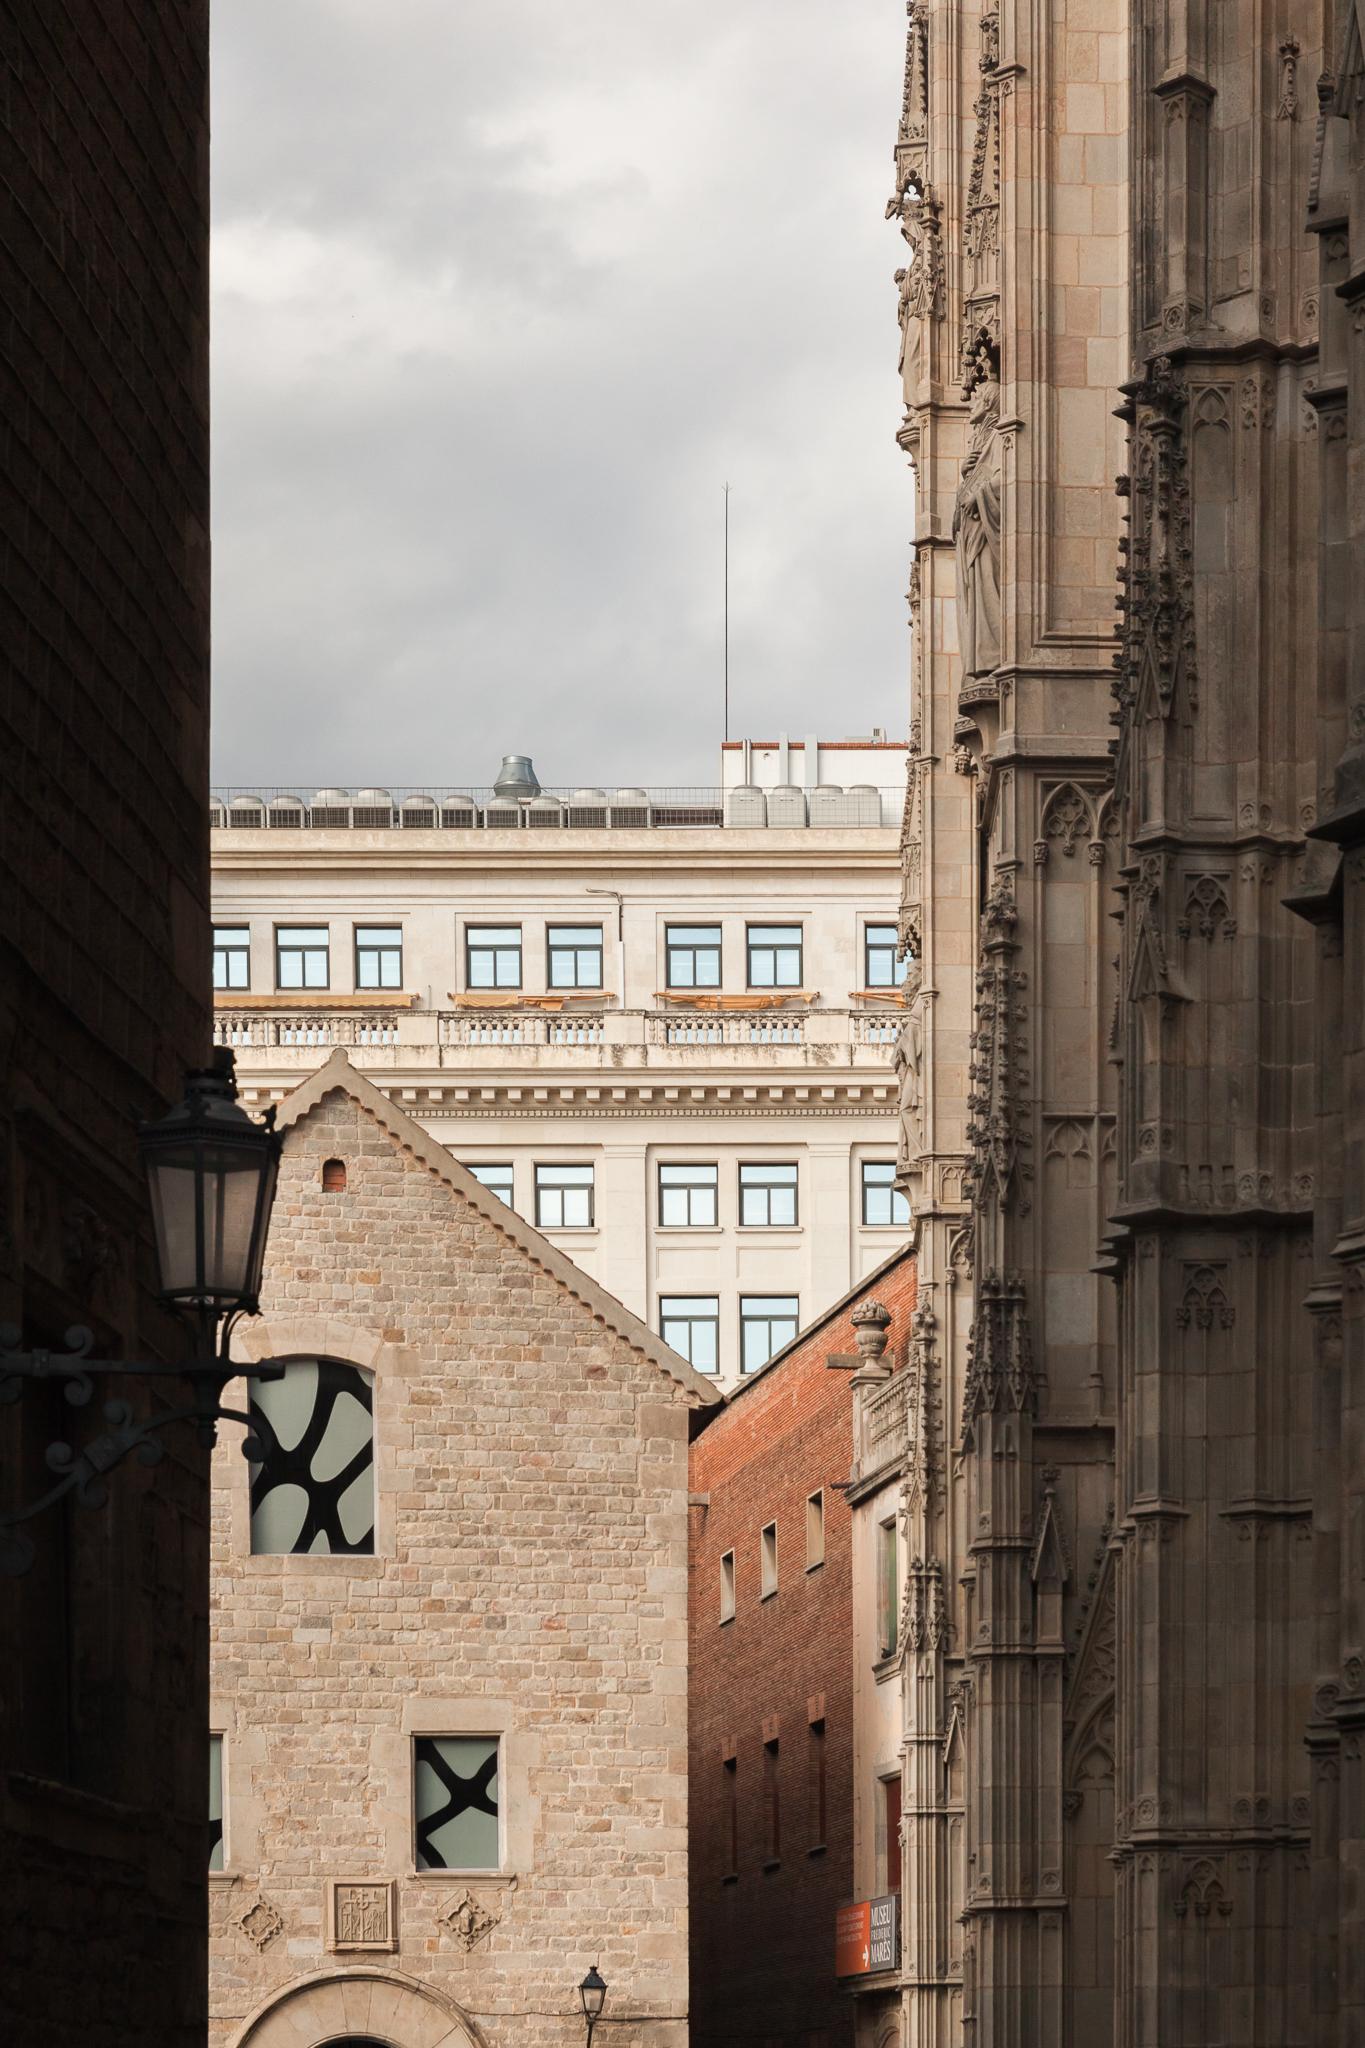 Barcelona, Spain - 2017